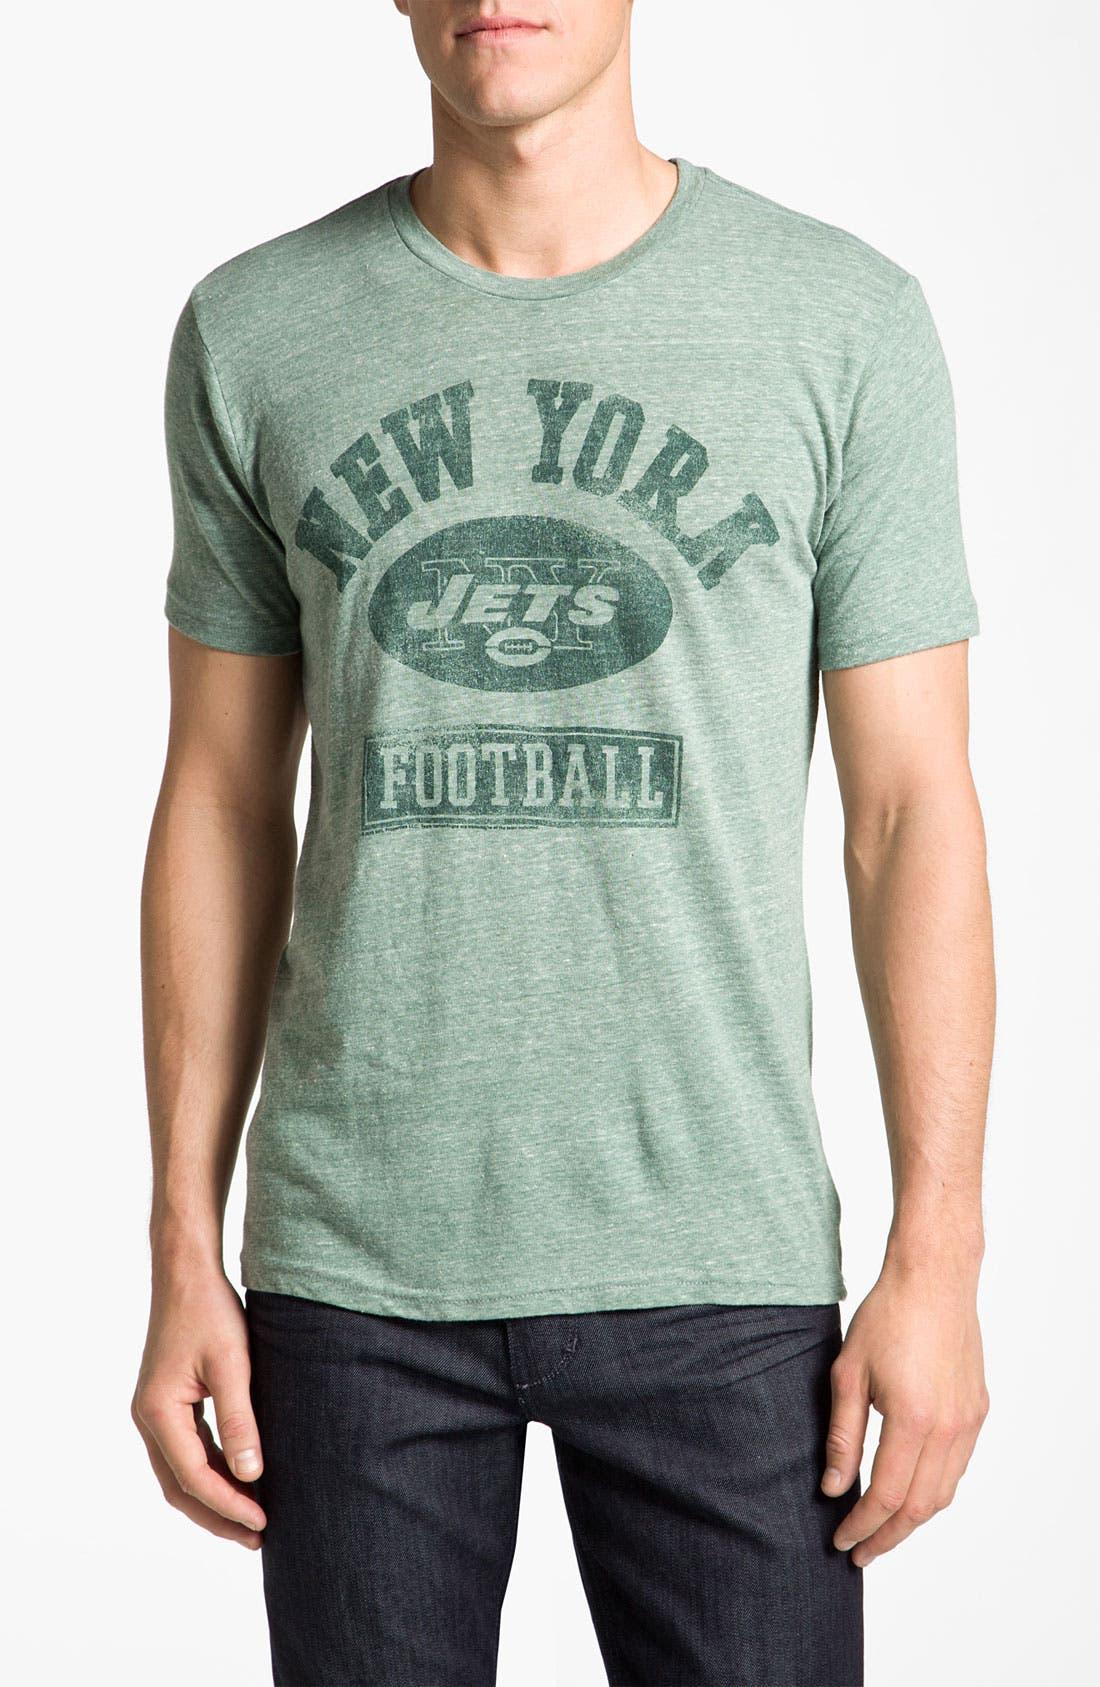 Alternate Image 1 Selected - Junk Food 'New York Jets' T-Shirt